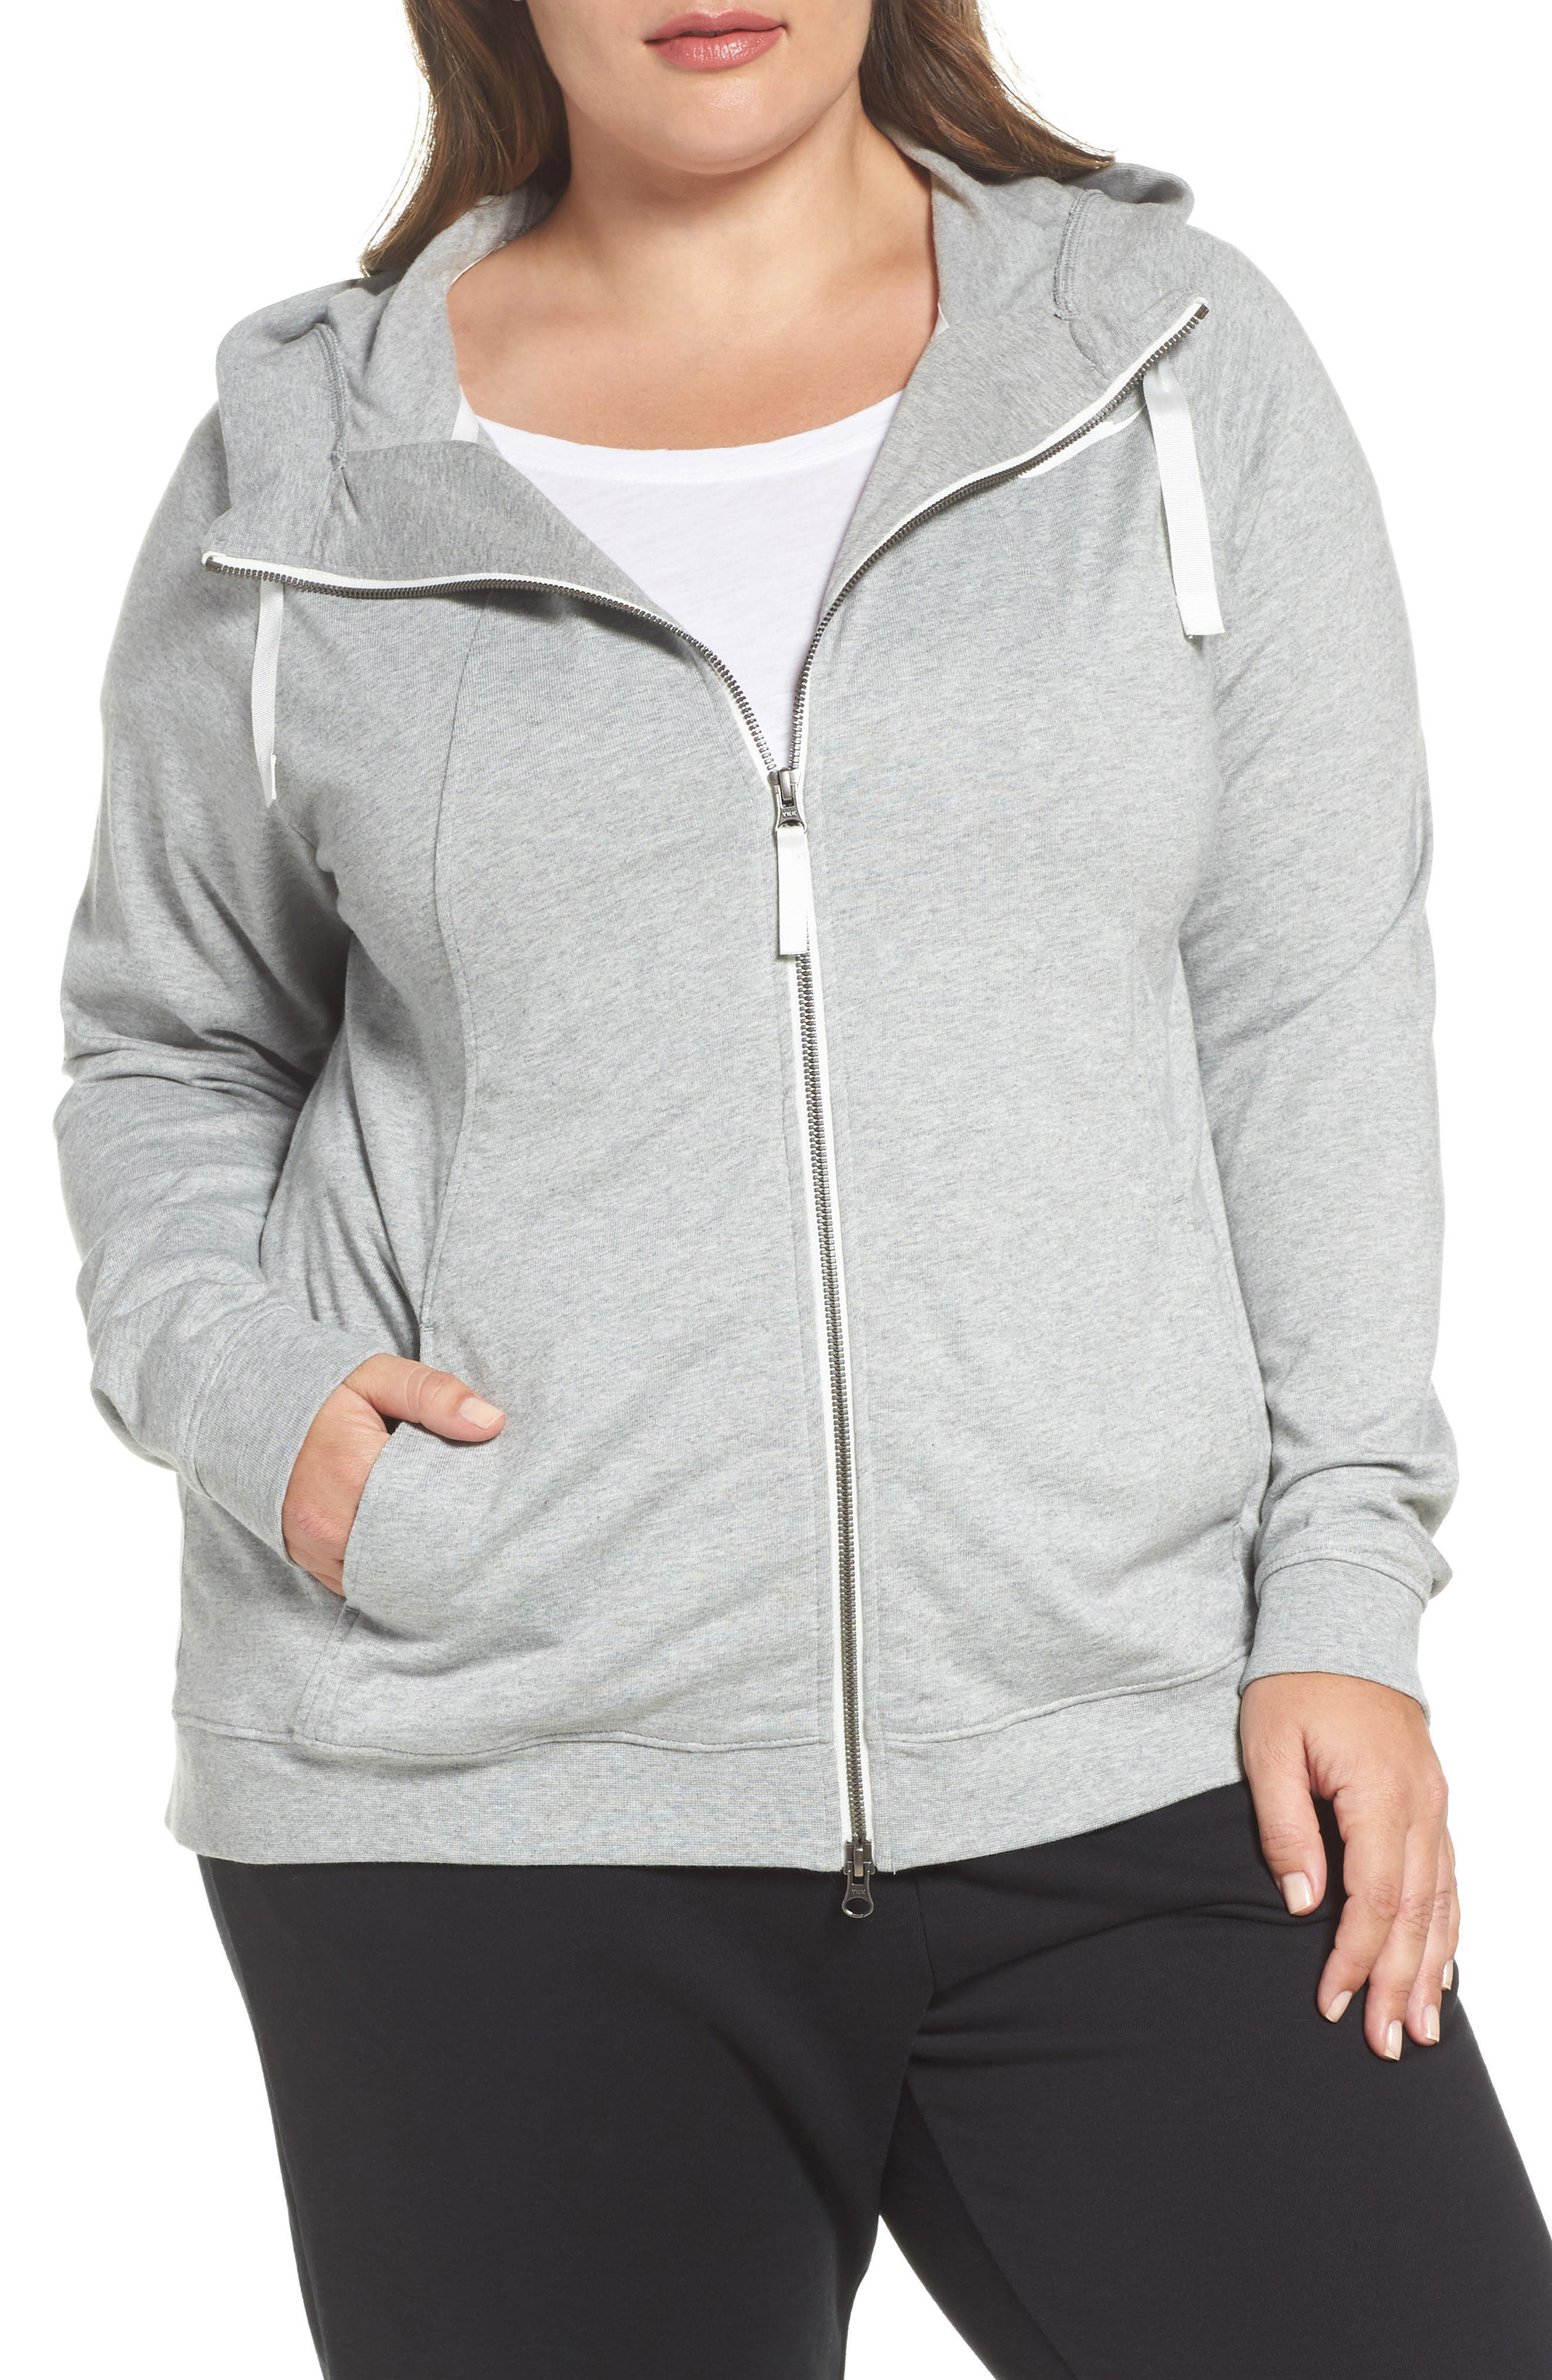 Sportswear Gym Classic Hoodie,                         Main,                         color, Dark Grey Heather/ Sail